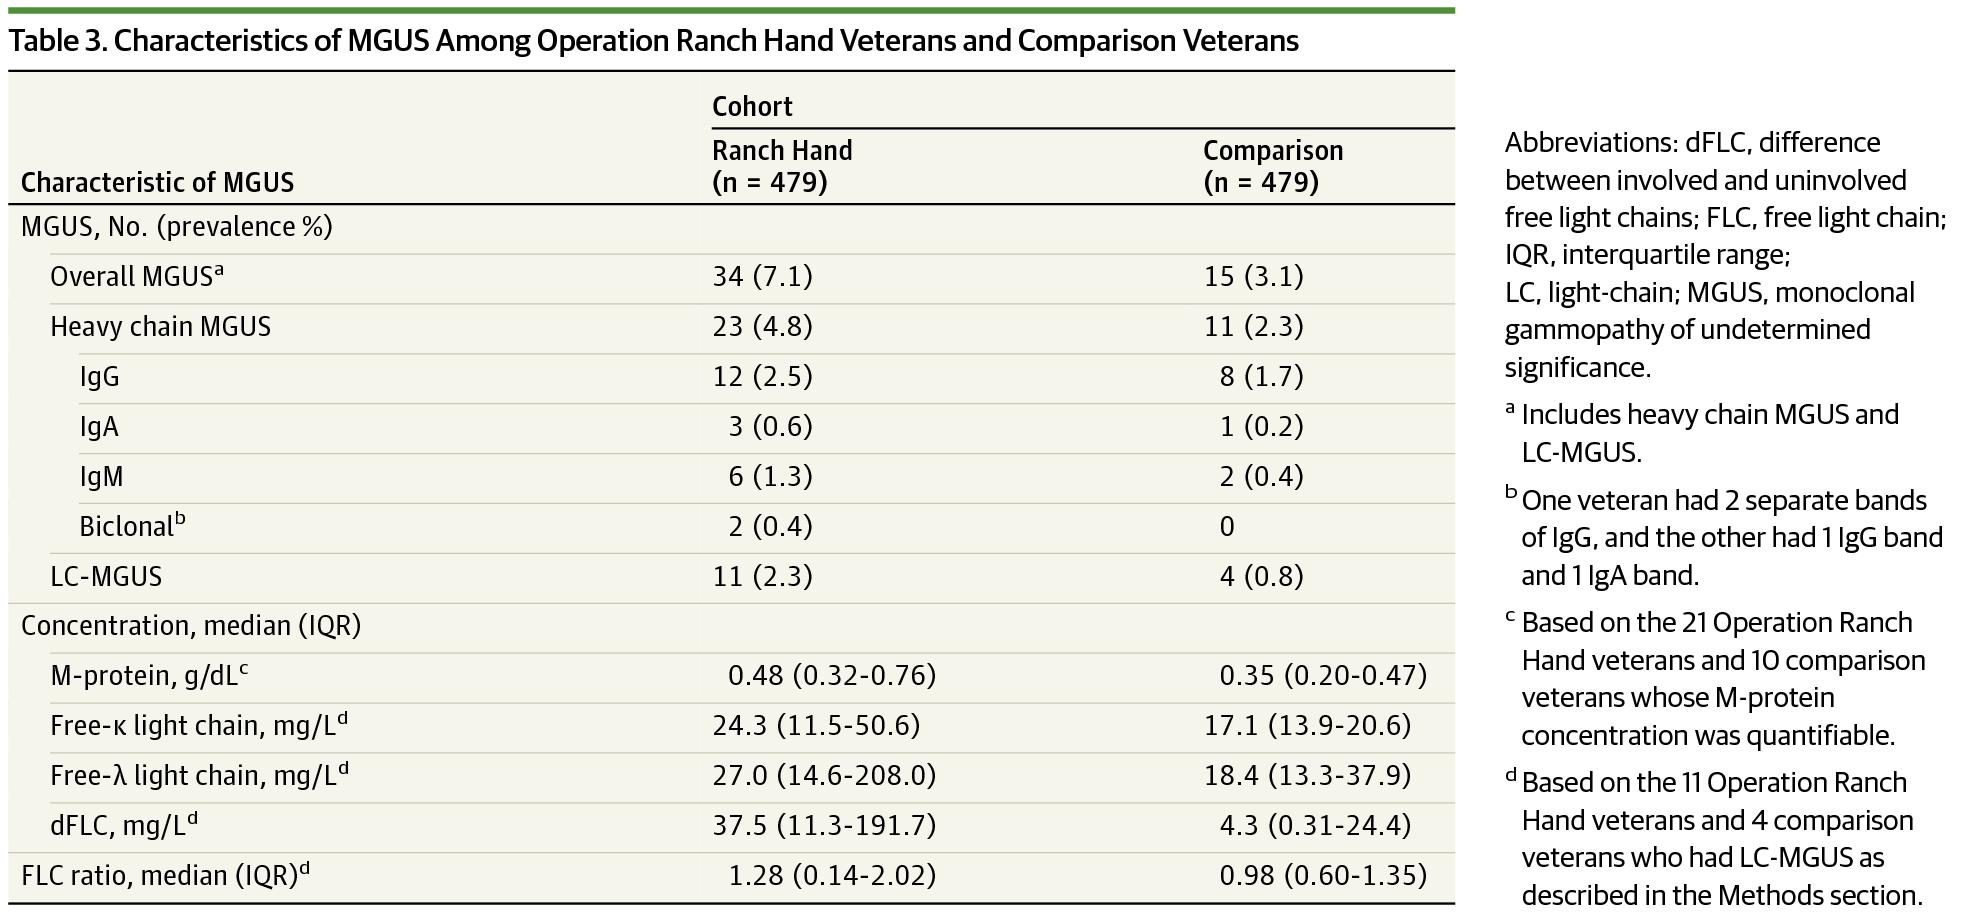 Agent Orange Exposure and Monoclonal Gammopathy